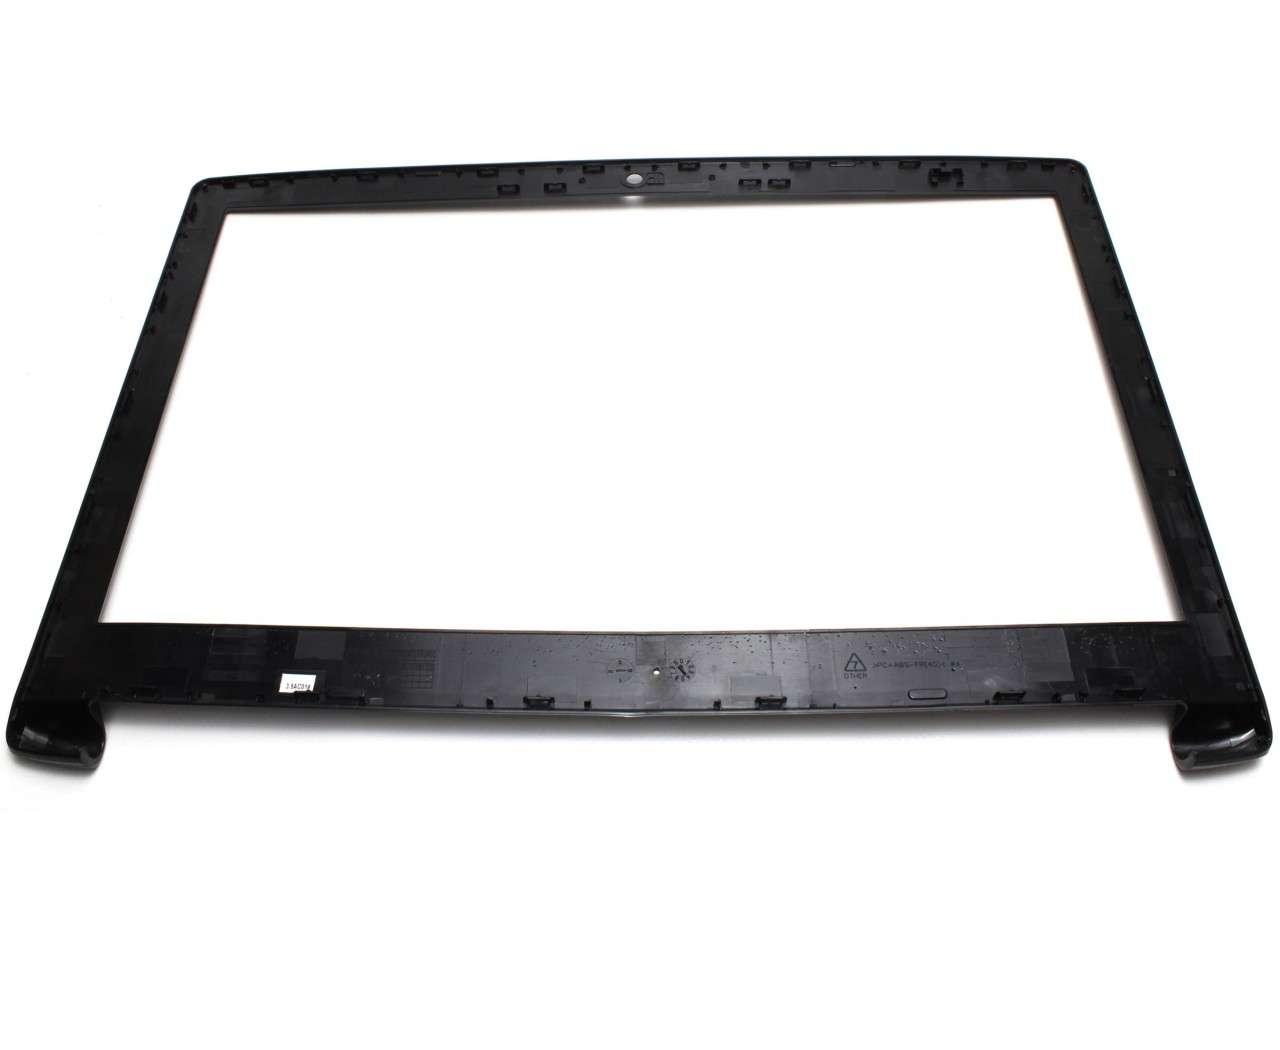 Rama Display Acer Aspire A315-41G Bezel Front Cover Neagra imagine powerlaptop.ro 2021